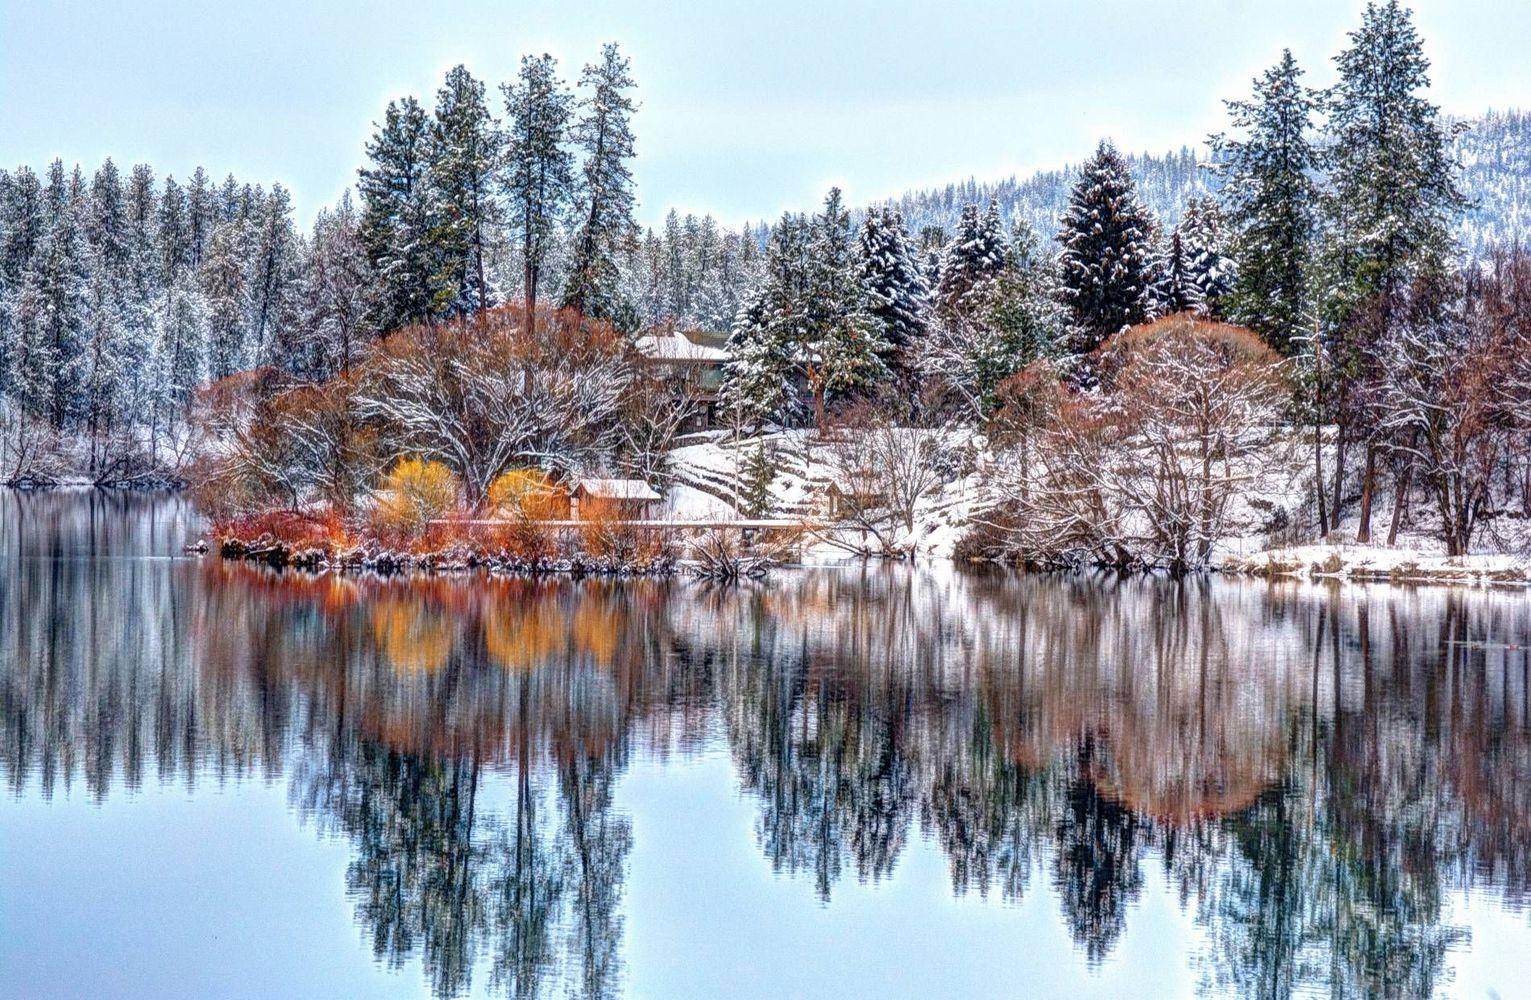 """Winter in 9 Mile"" by Mark Ament https://gurushots.com/notwhoiwuz/photos?tc=2f714573798c4445d3810149174a9e47"